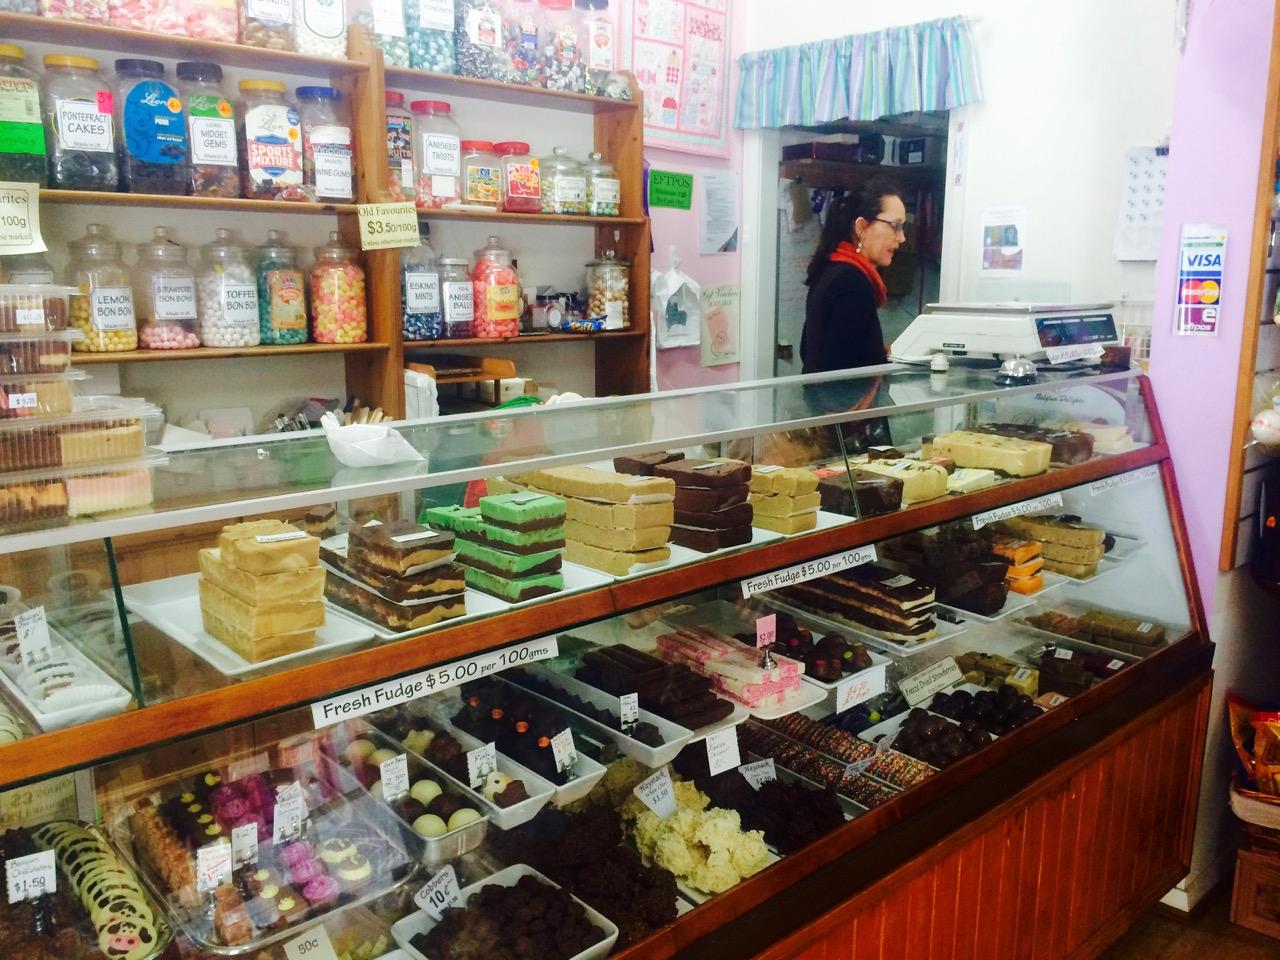 The Maleny Fudge Store